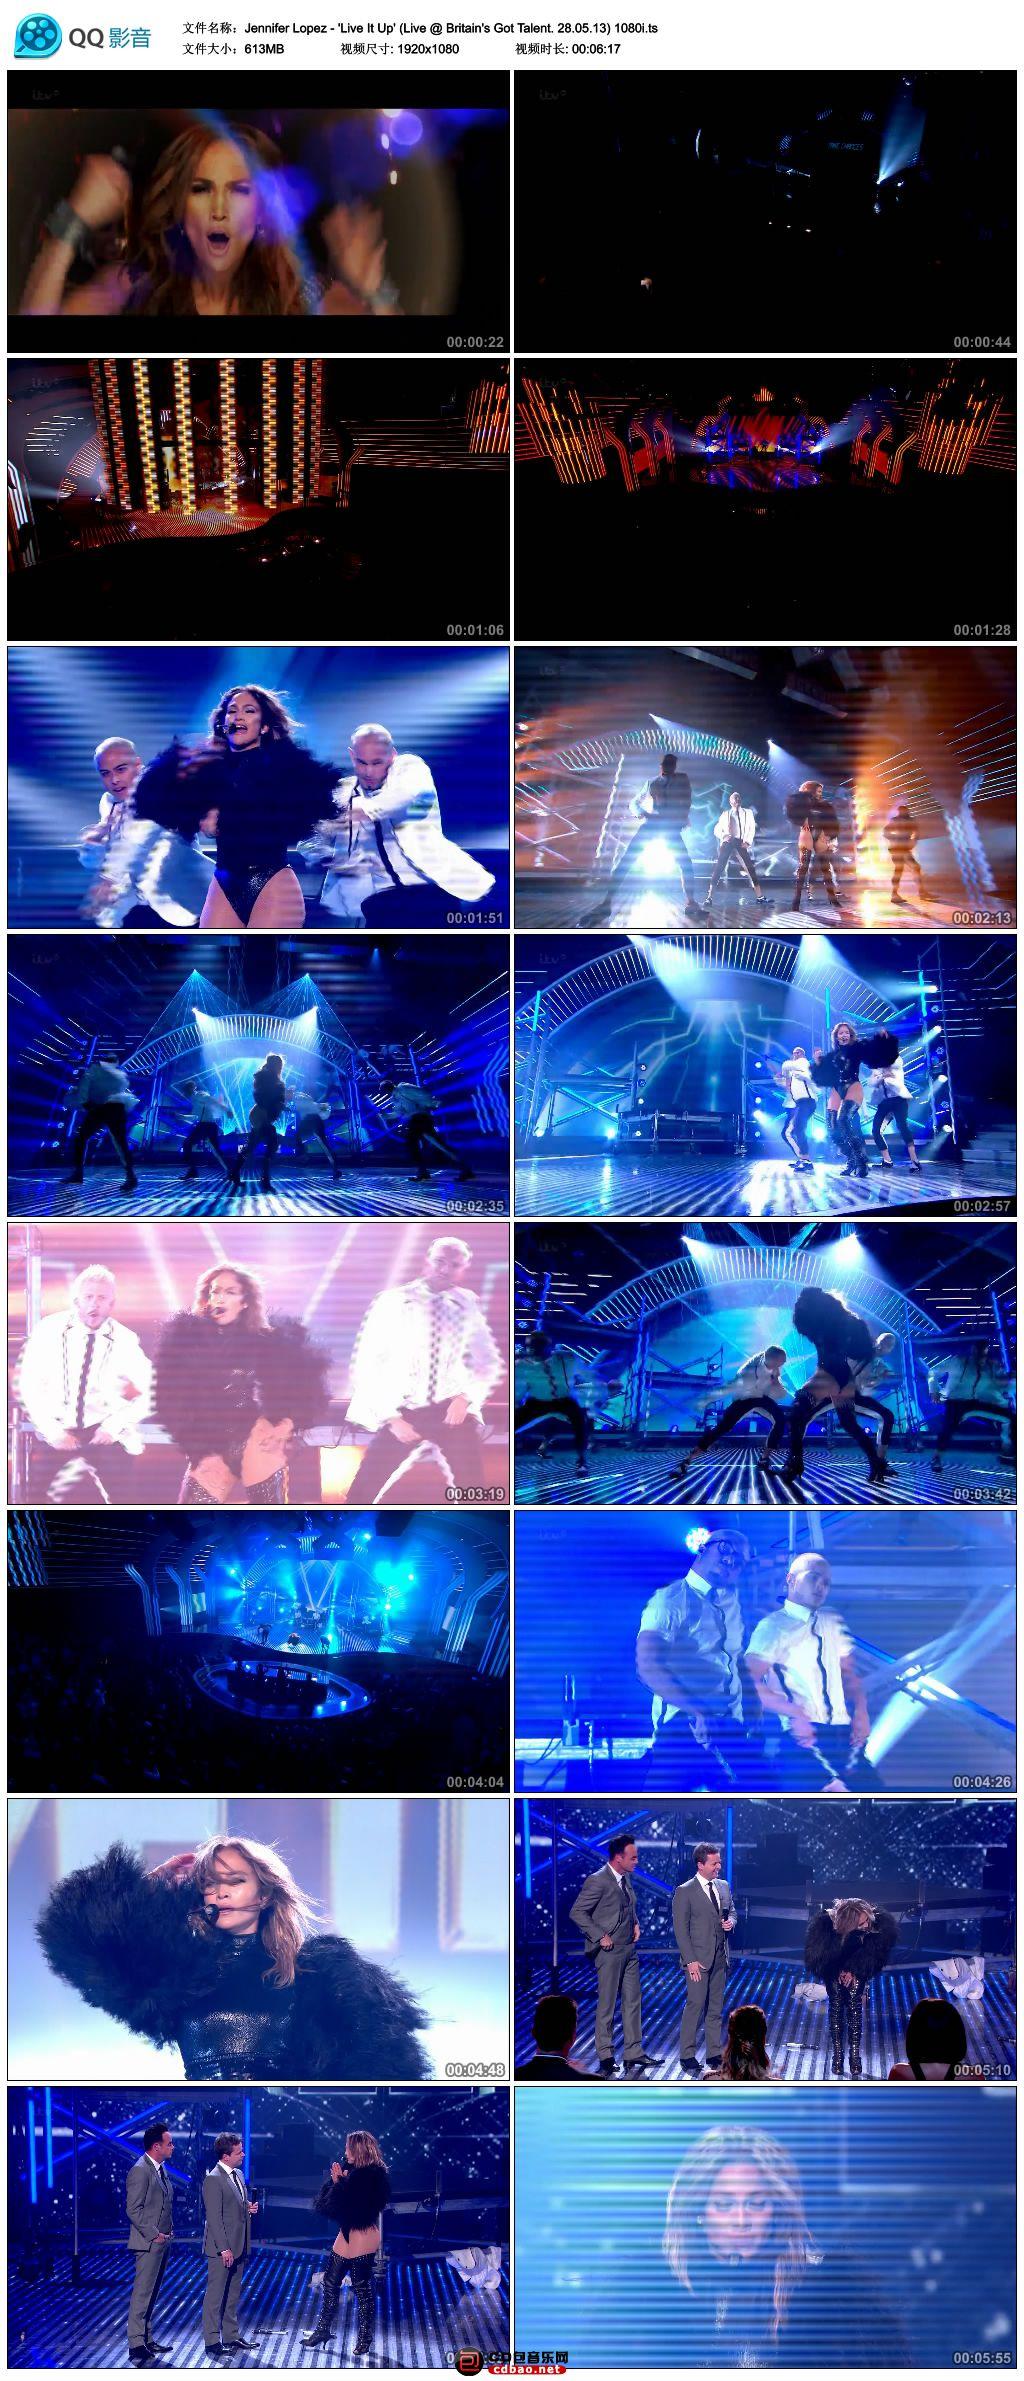 Jennifer Lopez - 'Live It Up' (Live @ Britain's Got Talent. 28.05.jpg